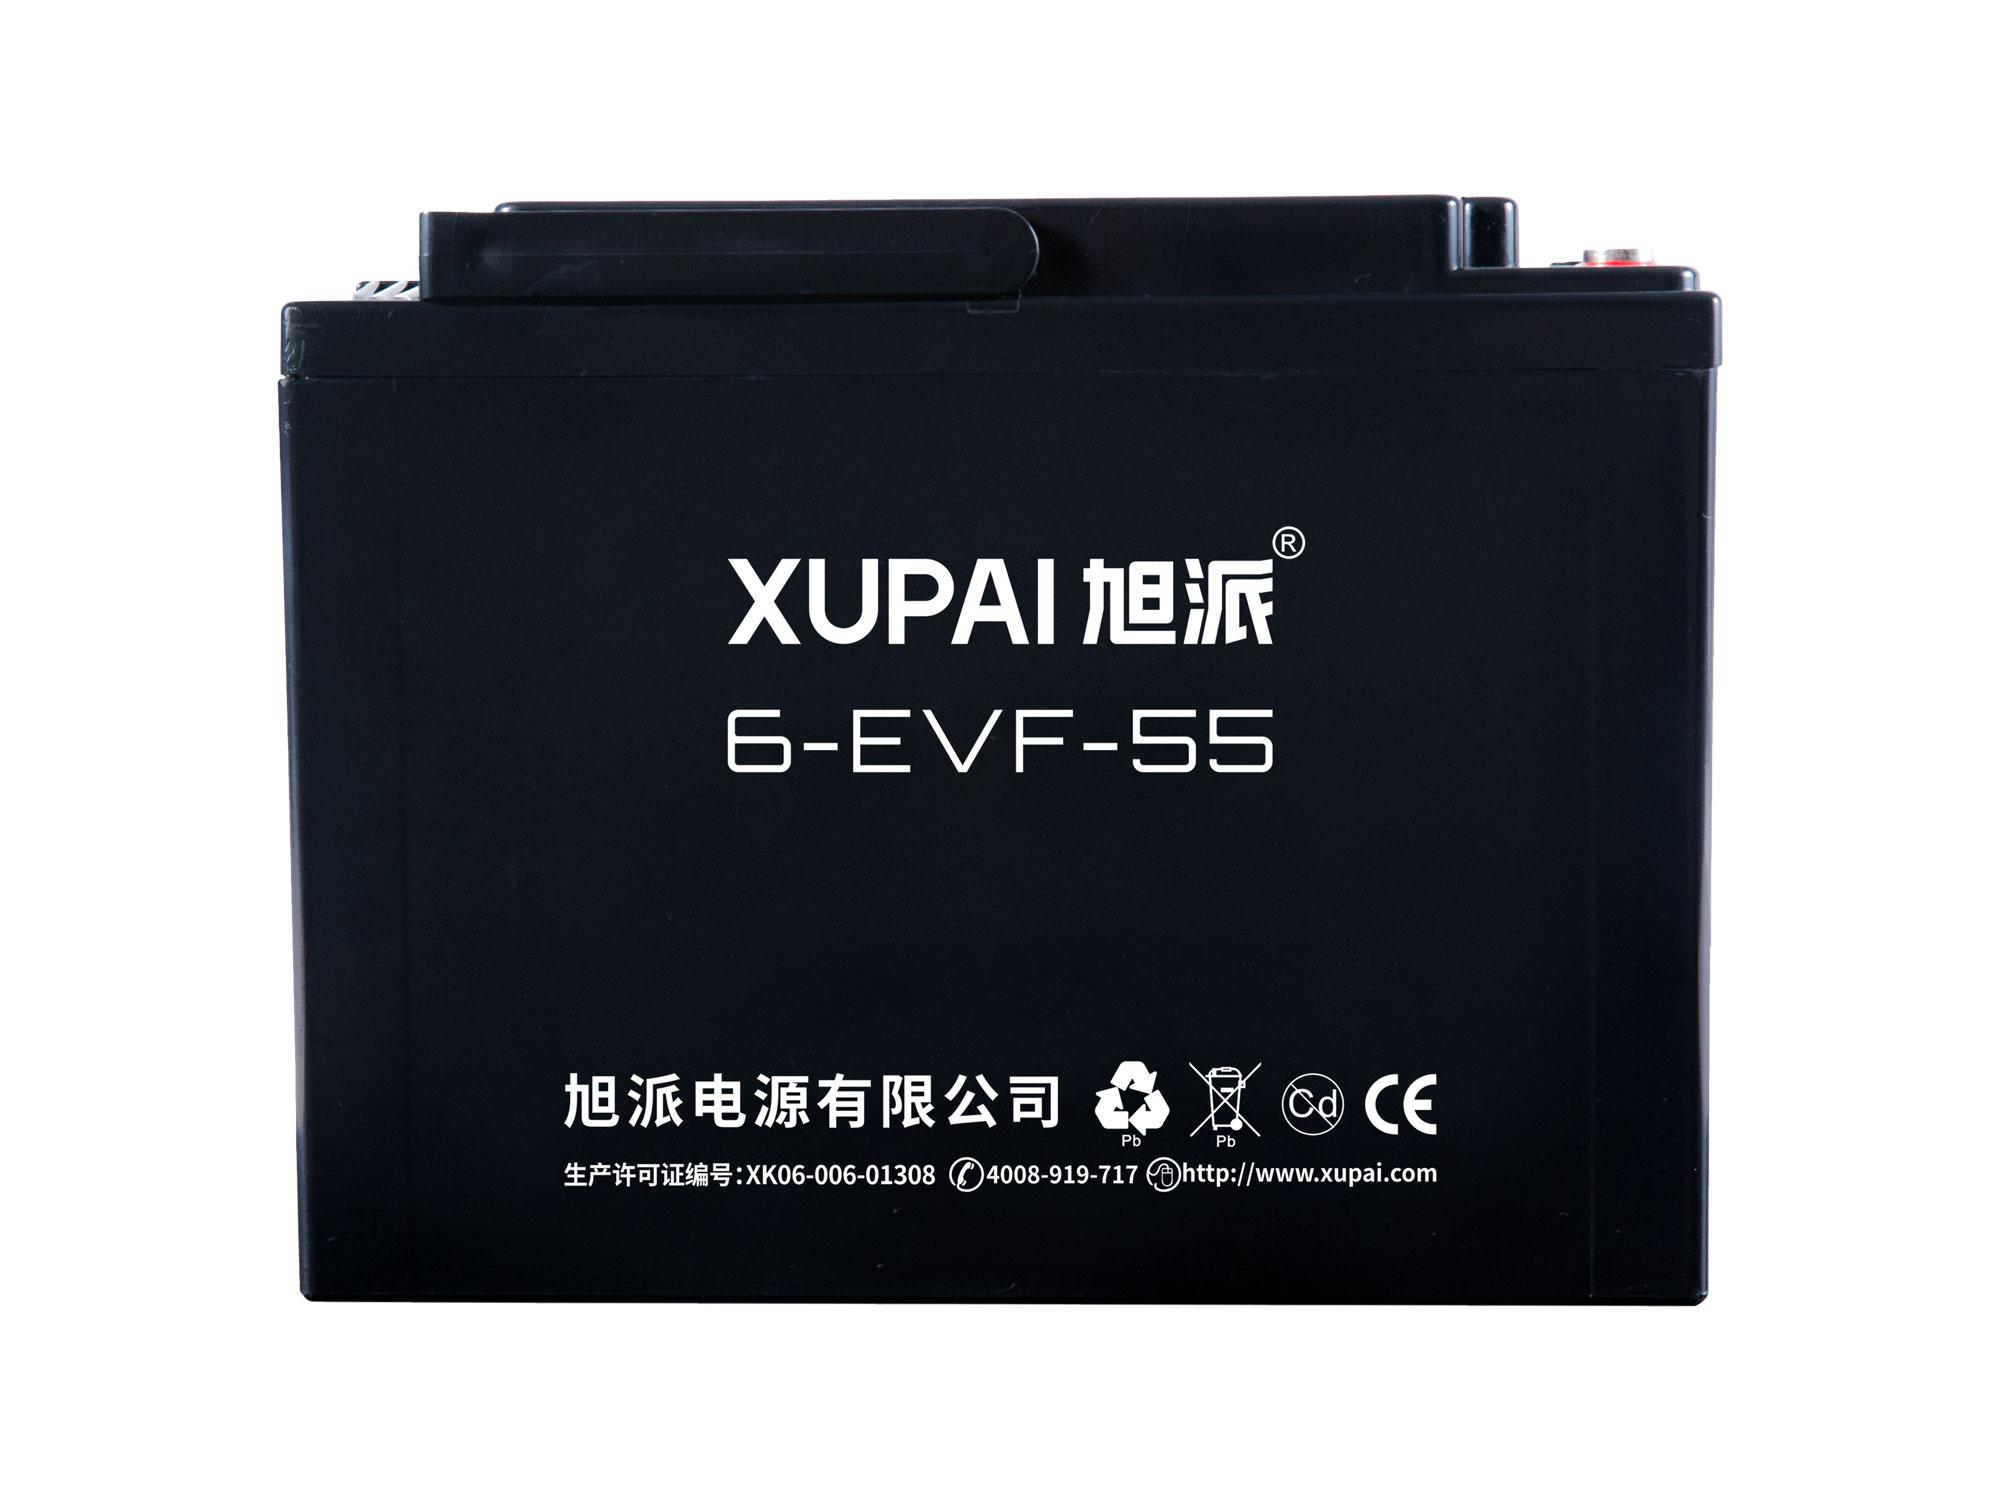 6-evf-55电动道路车电池